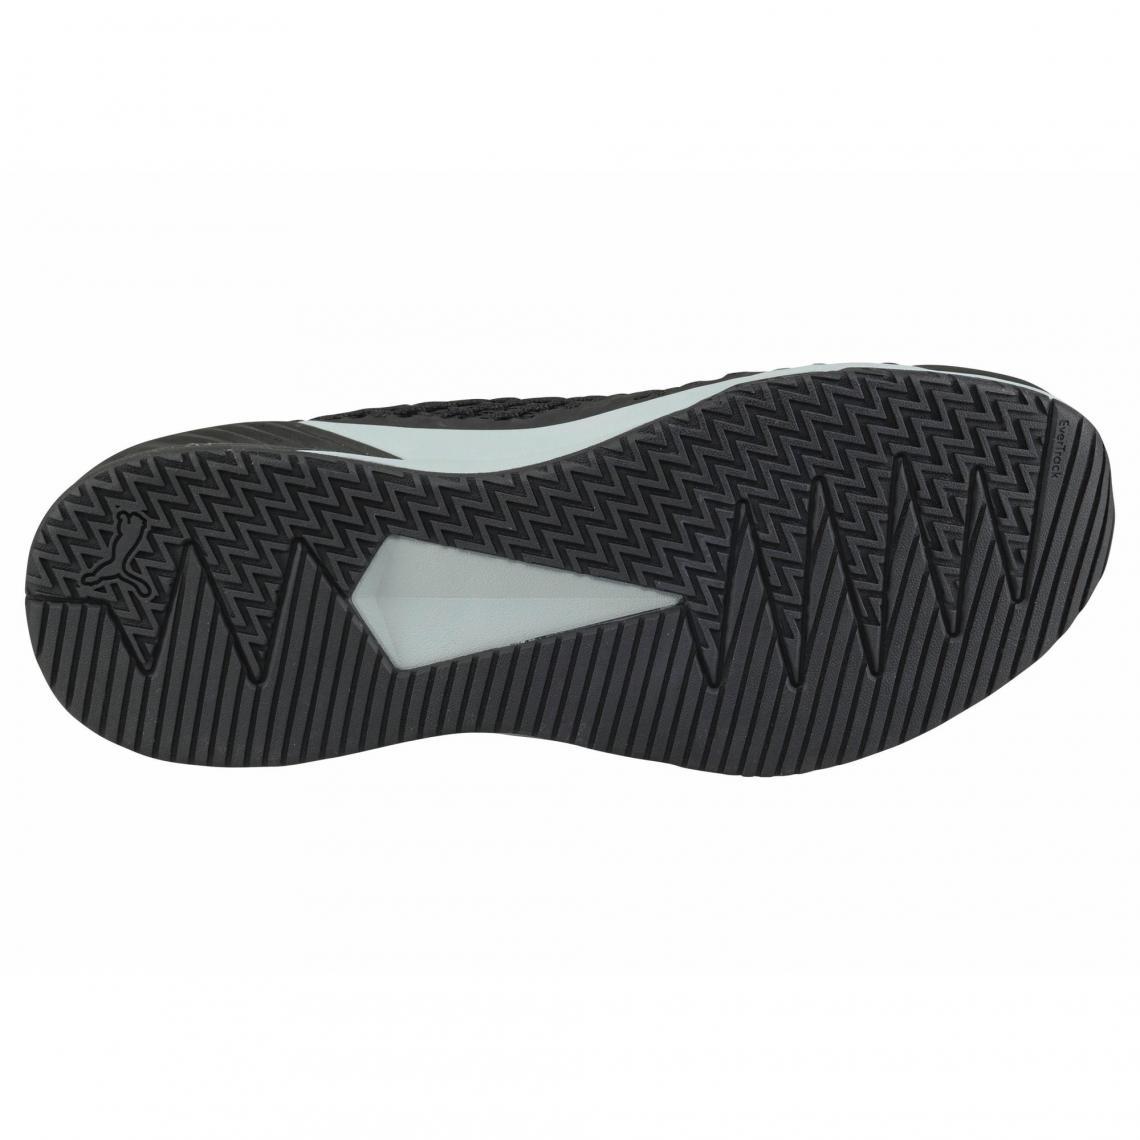 fc5314705f0 Puma Ignite Netfit XT chaussures de sport homme - Noir - Blanc Puma